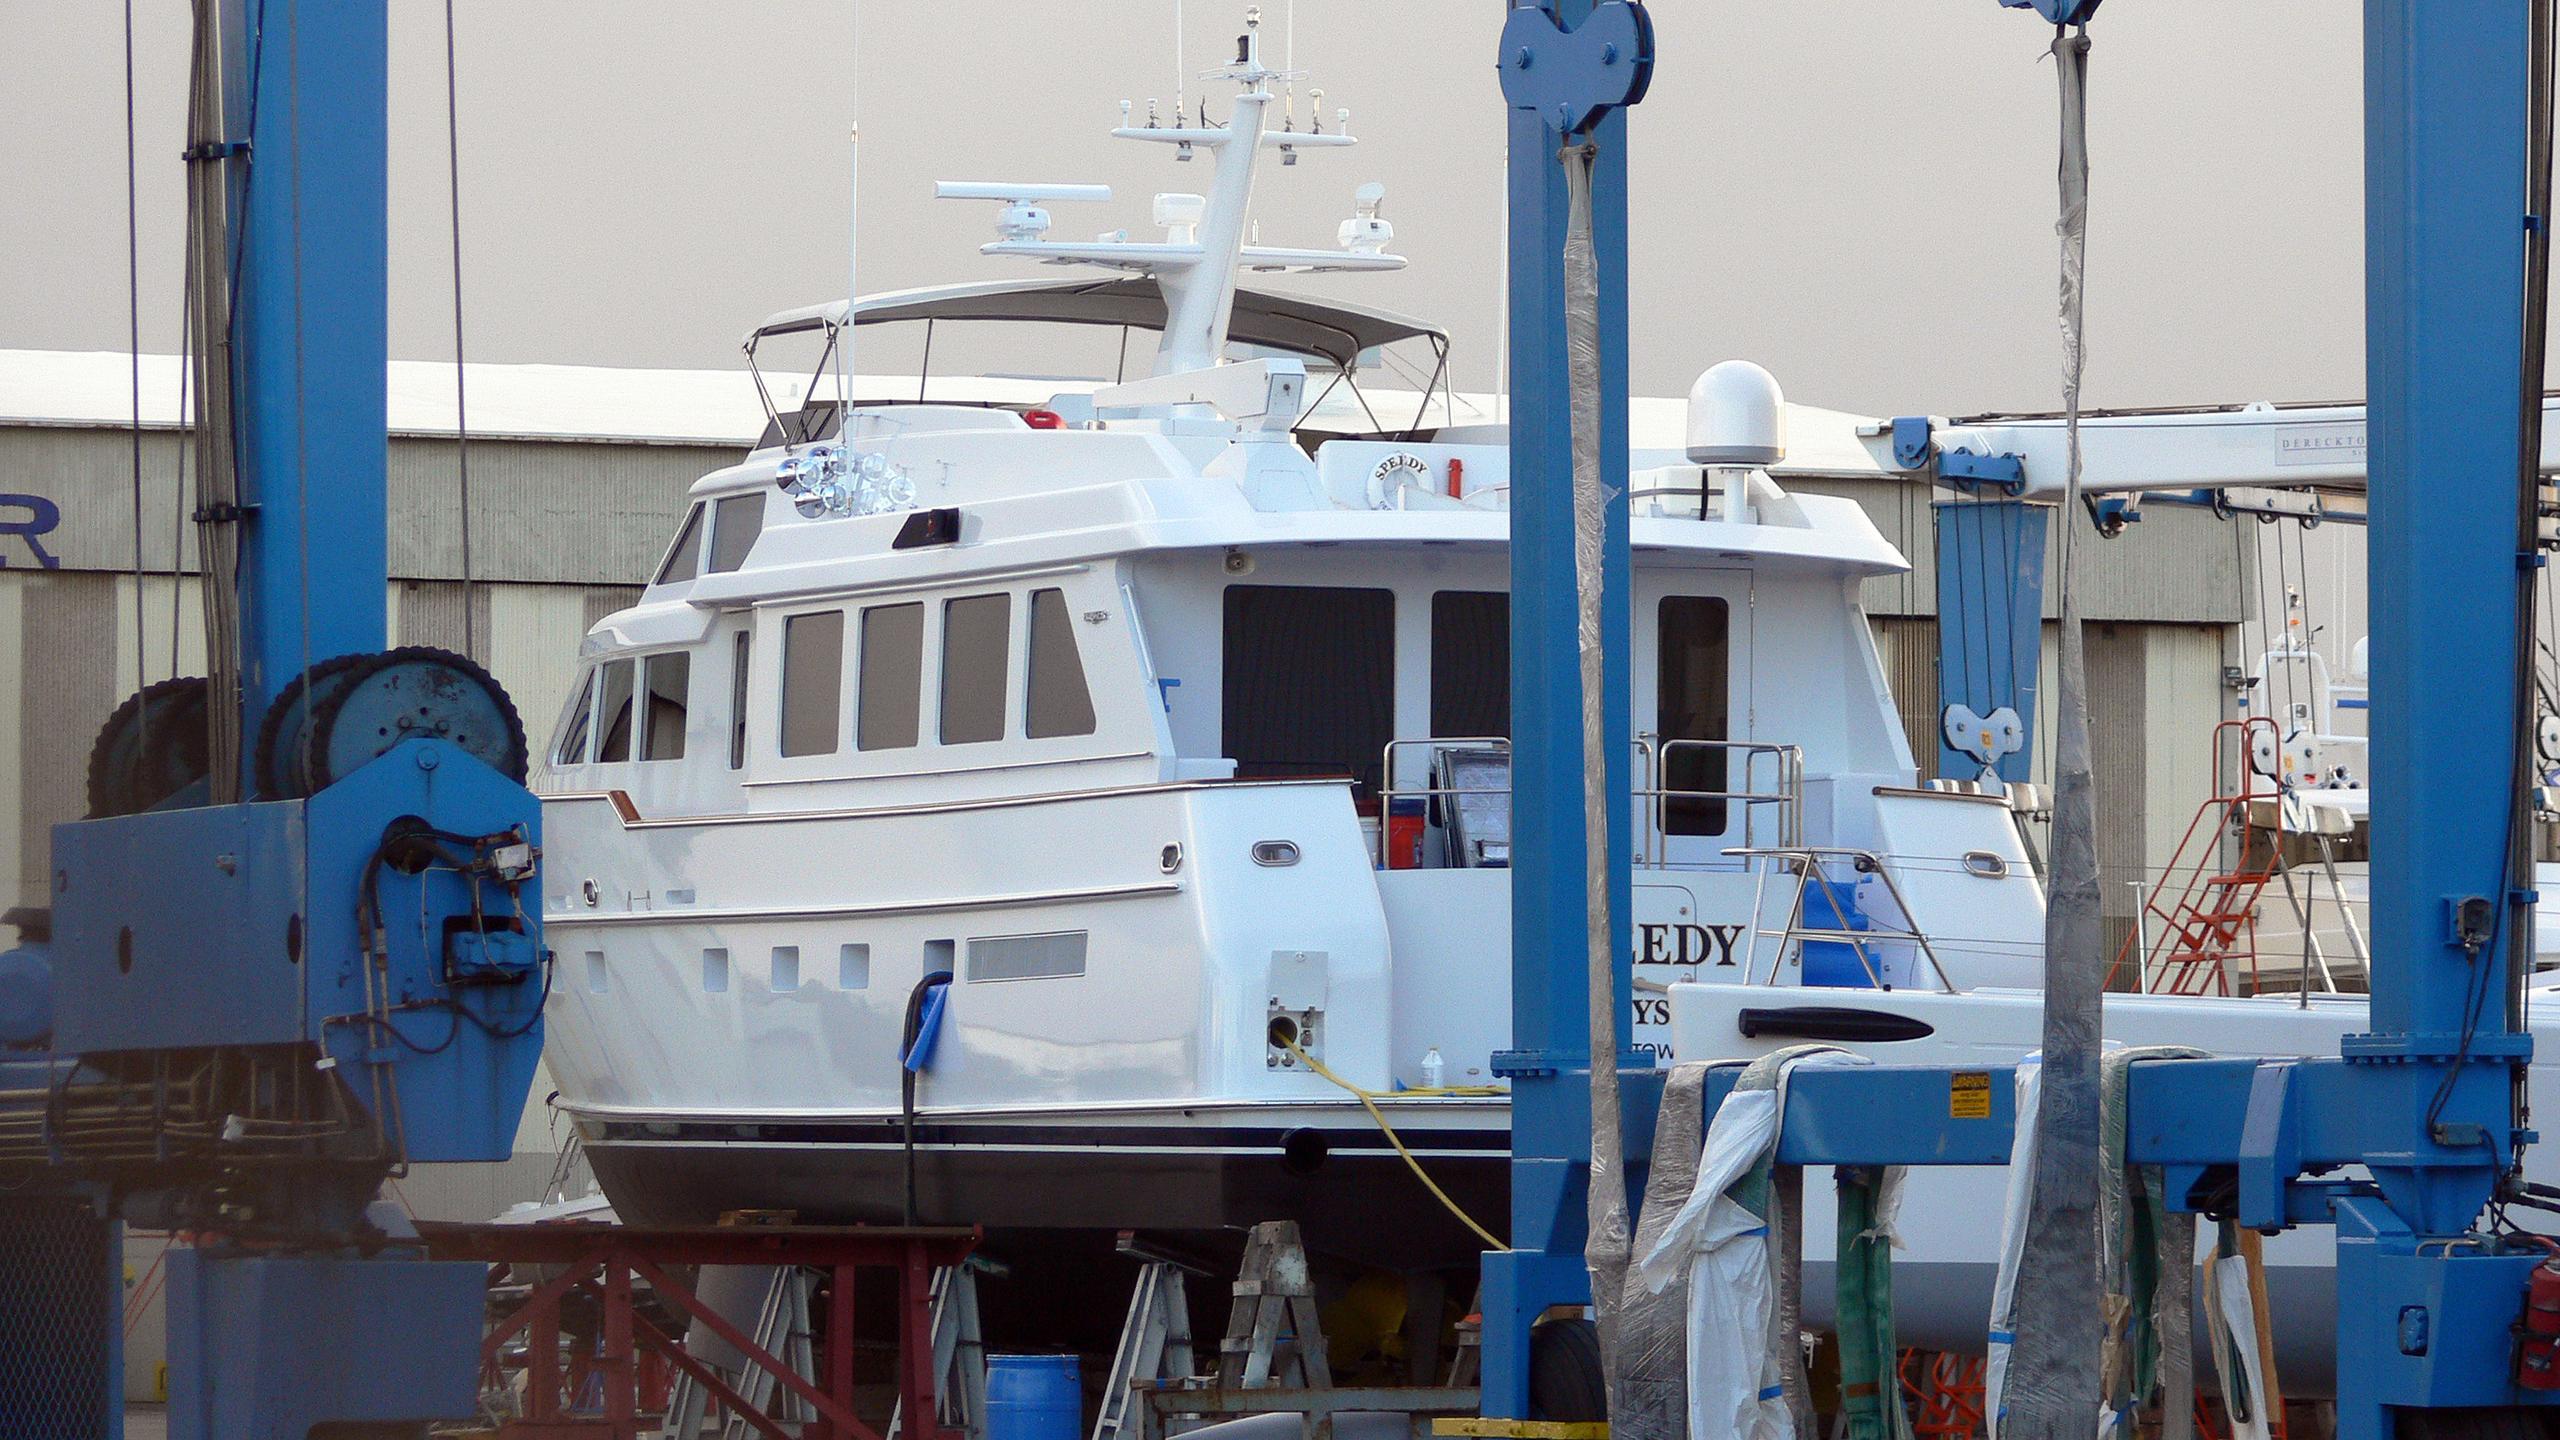 checkmate-motor-yacht-burger-boat-1999-26m-rear-dock